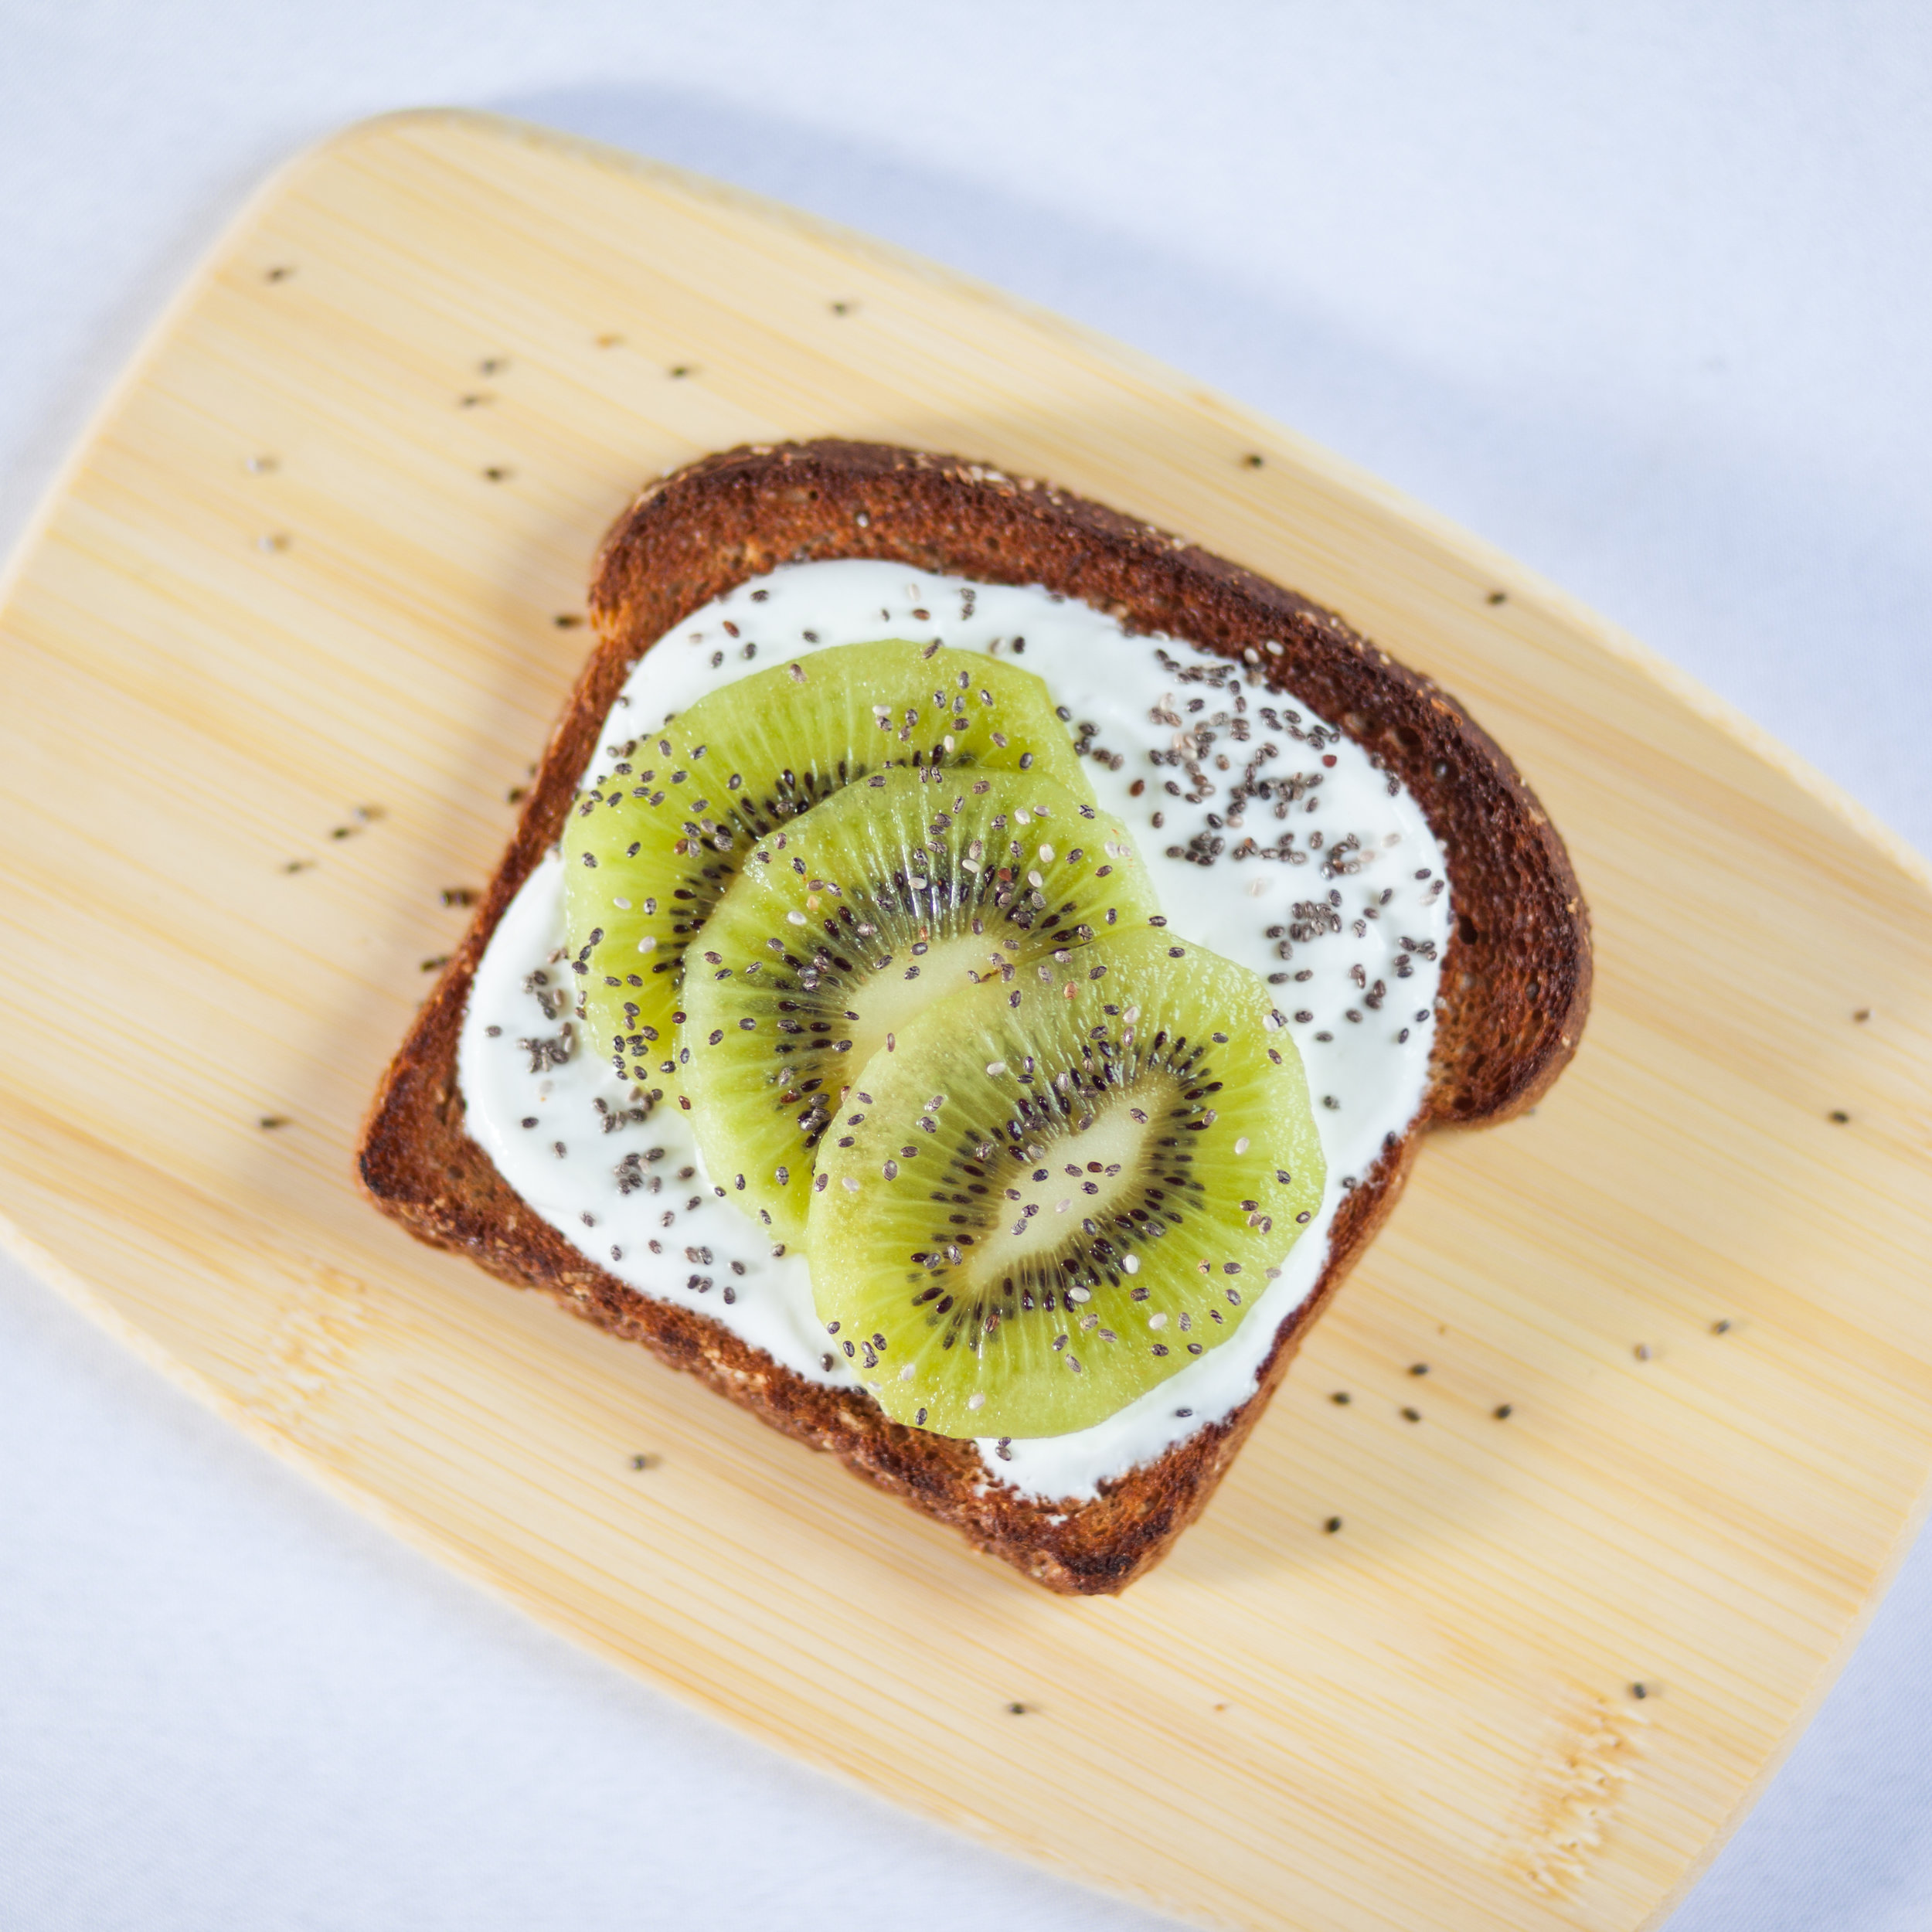 Toast topped greek yogurt, kiwi slices, and chia seeds